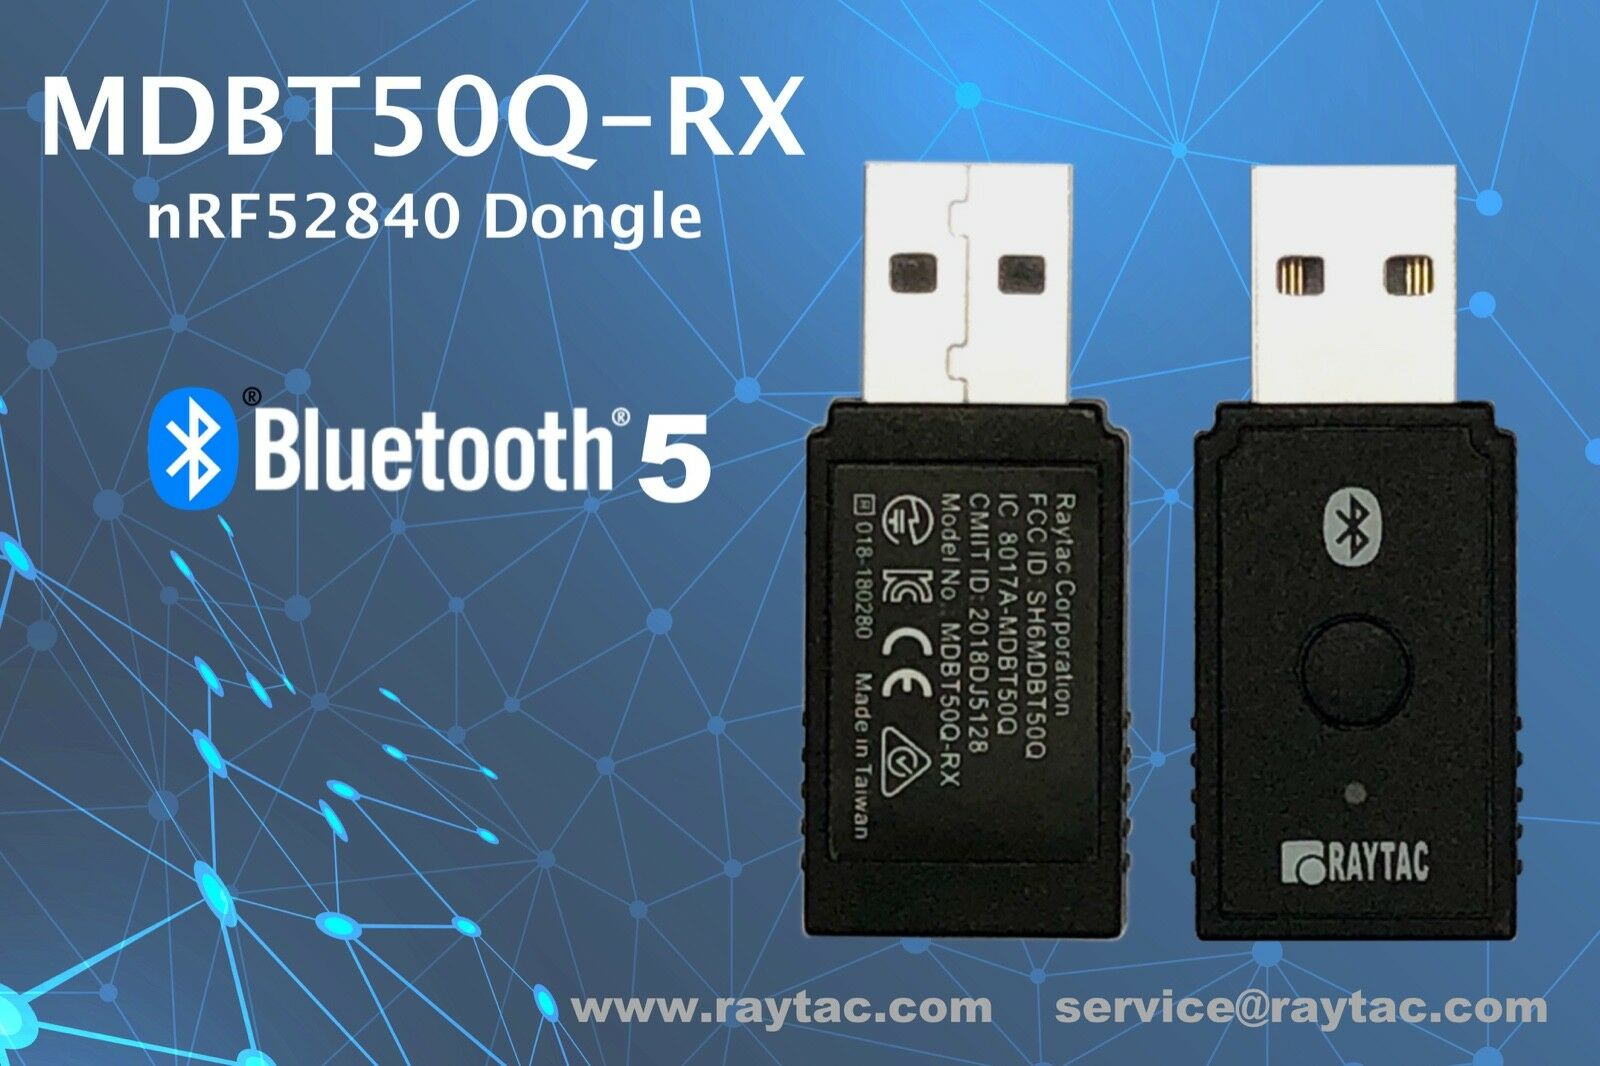 Nordic Nrf52840 USB Dongle BT 5 0 Ble Raytac Mdbt50q-rx Bluetooth Long Range